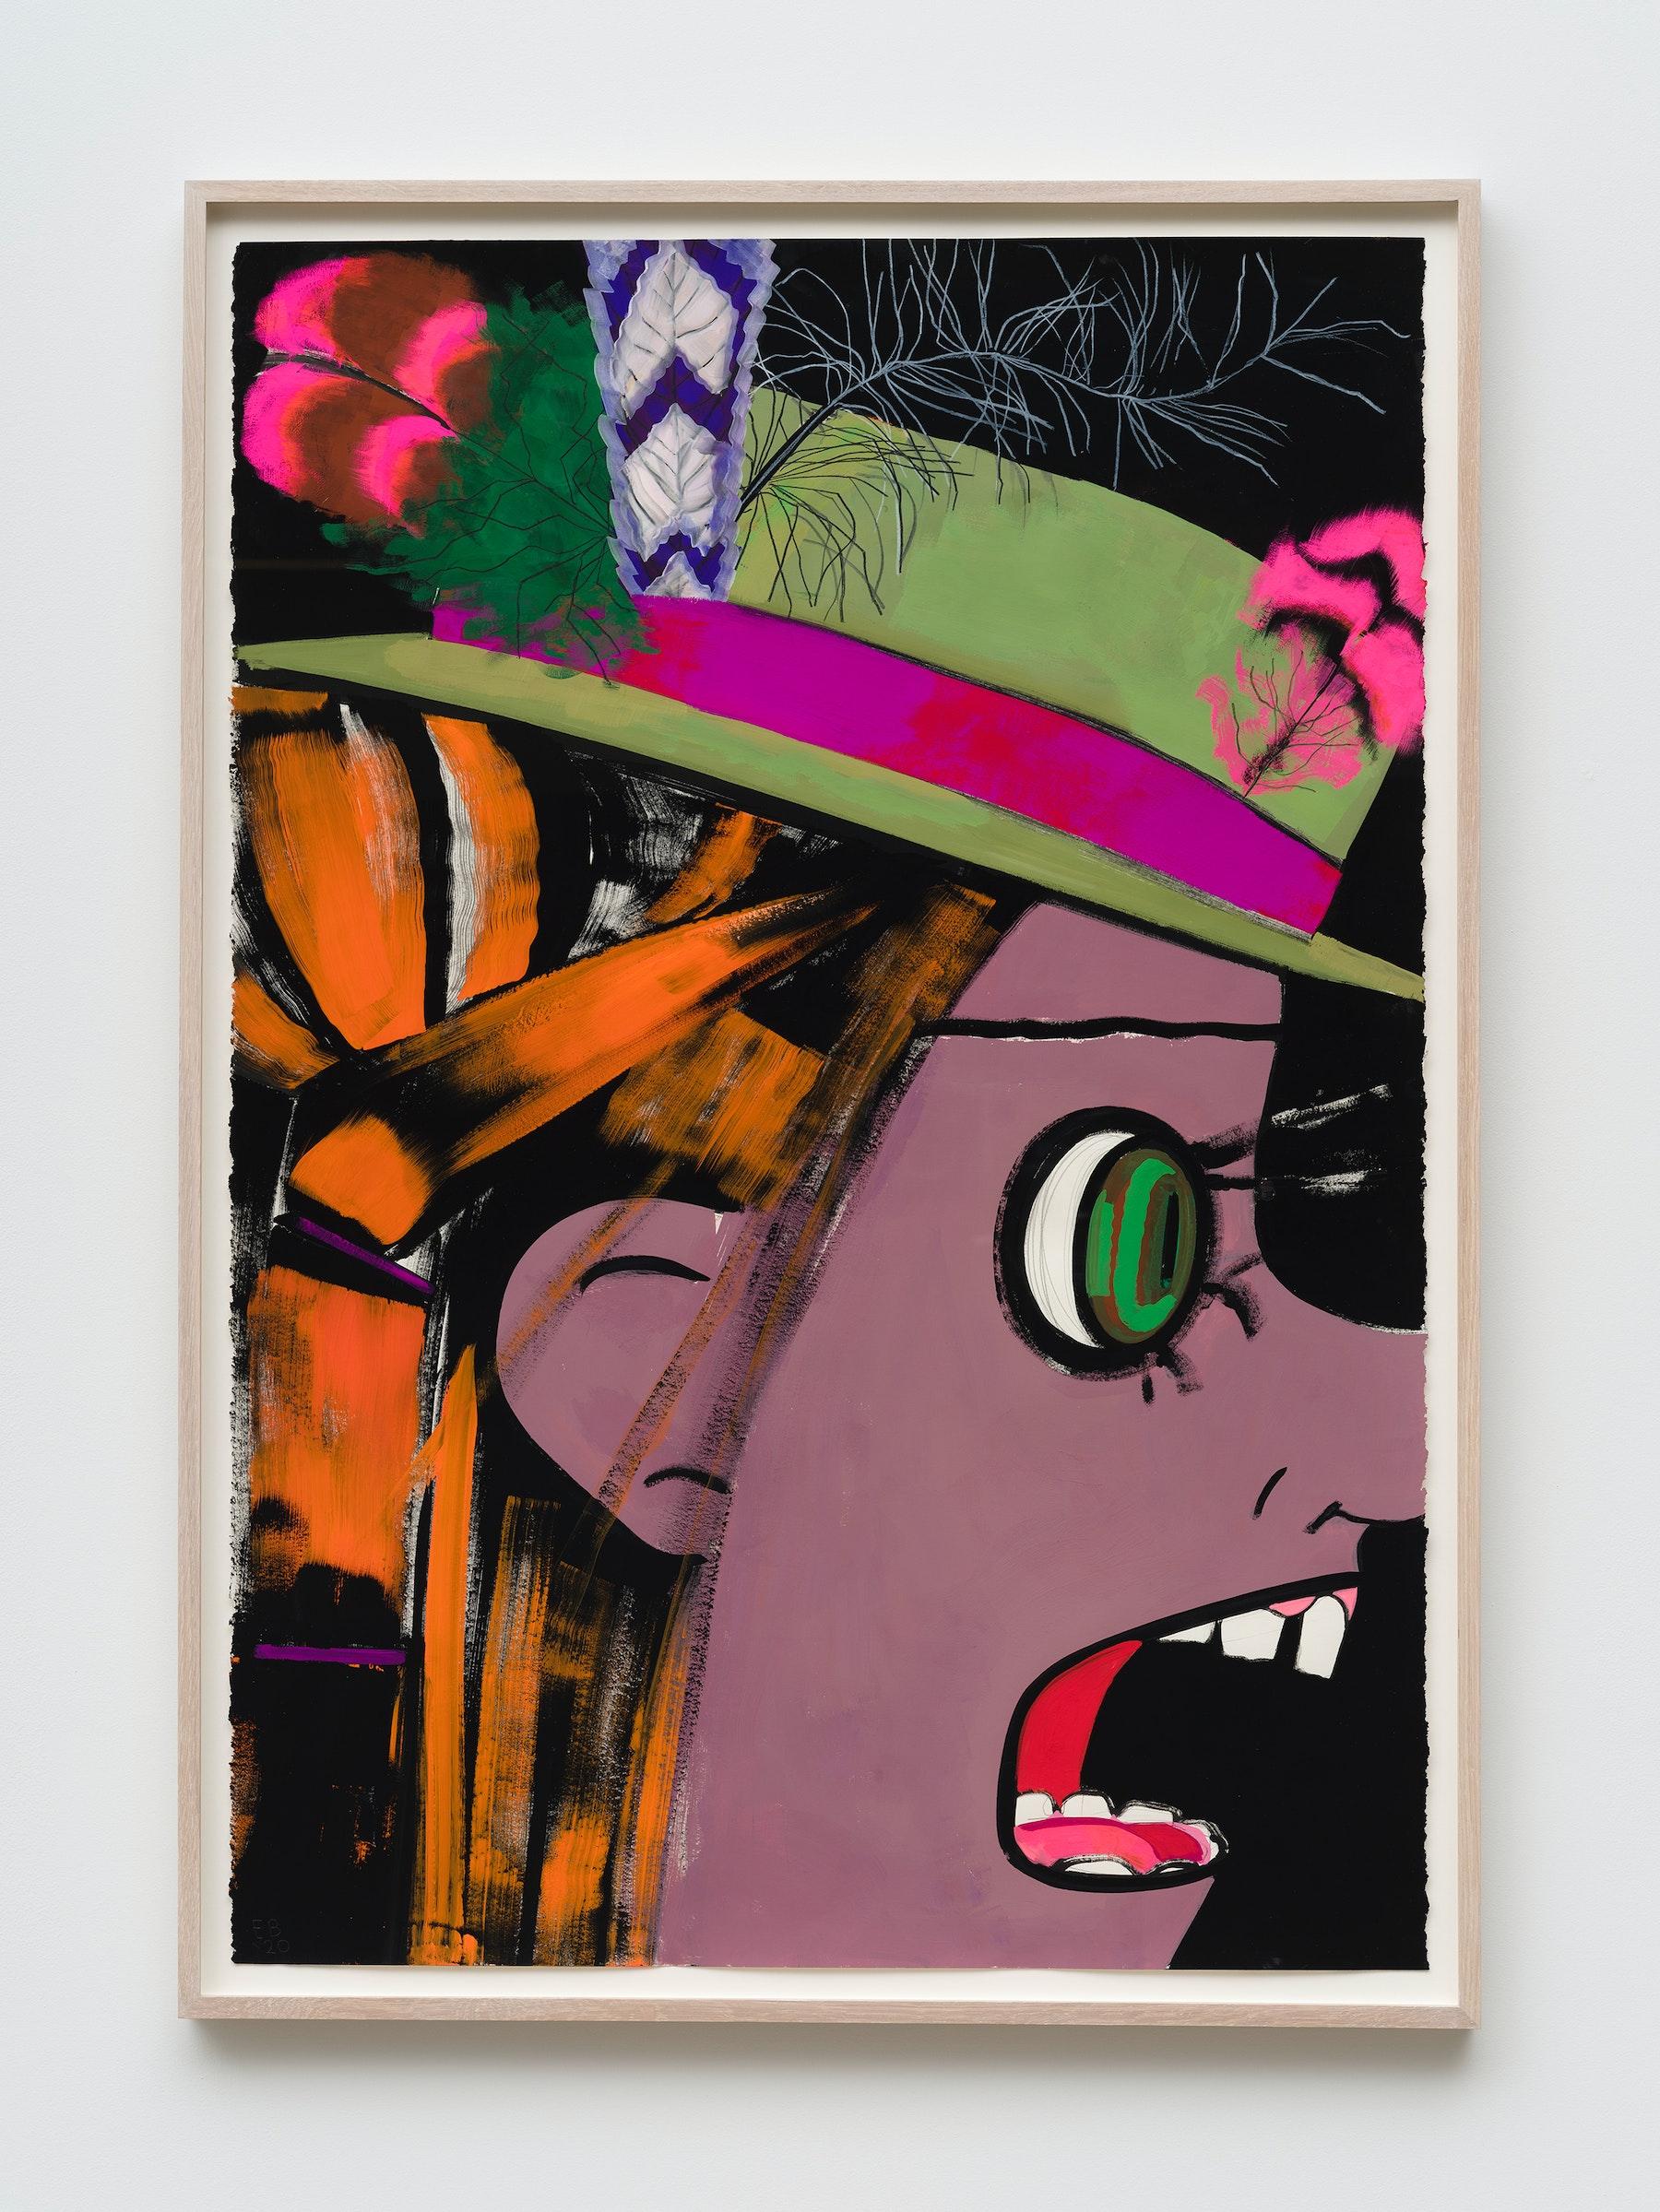 "Ellen Berkenblit ""Green Velvet Hat,"" 2020 Gouache and graphite on Legion Stonehenge paper 44"" x 30"" [HxW] (111.76 x 76.2 cm) Inventory #BER195 Courtesy of the artist and Vielmetter Los Angeles Photo credit: Jeff Mclane Signed ""EB '20"""